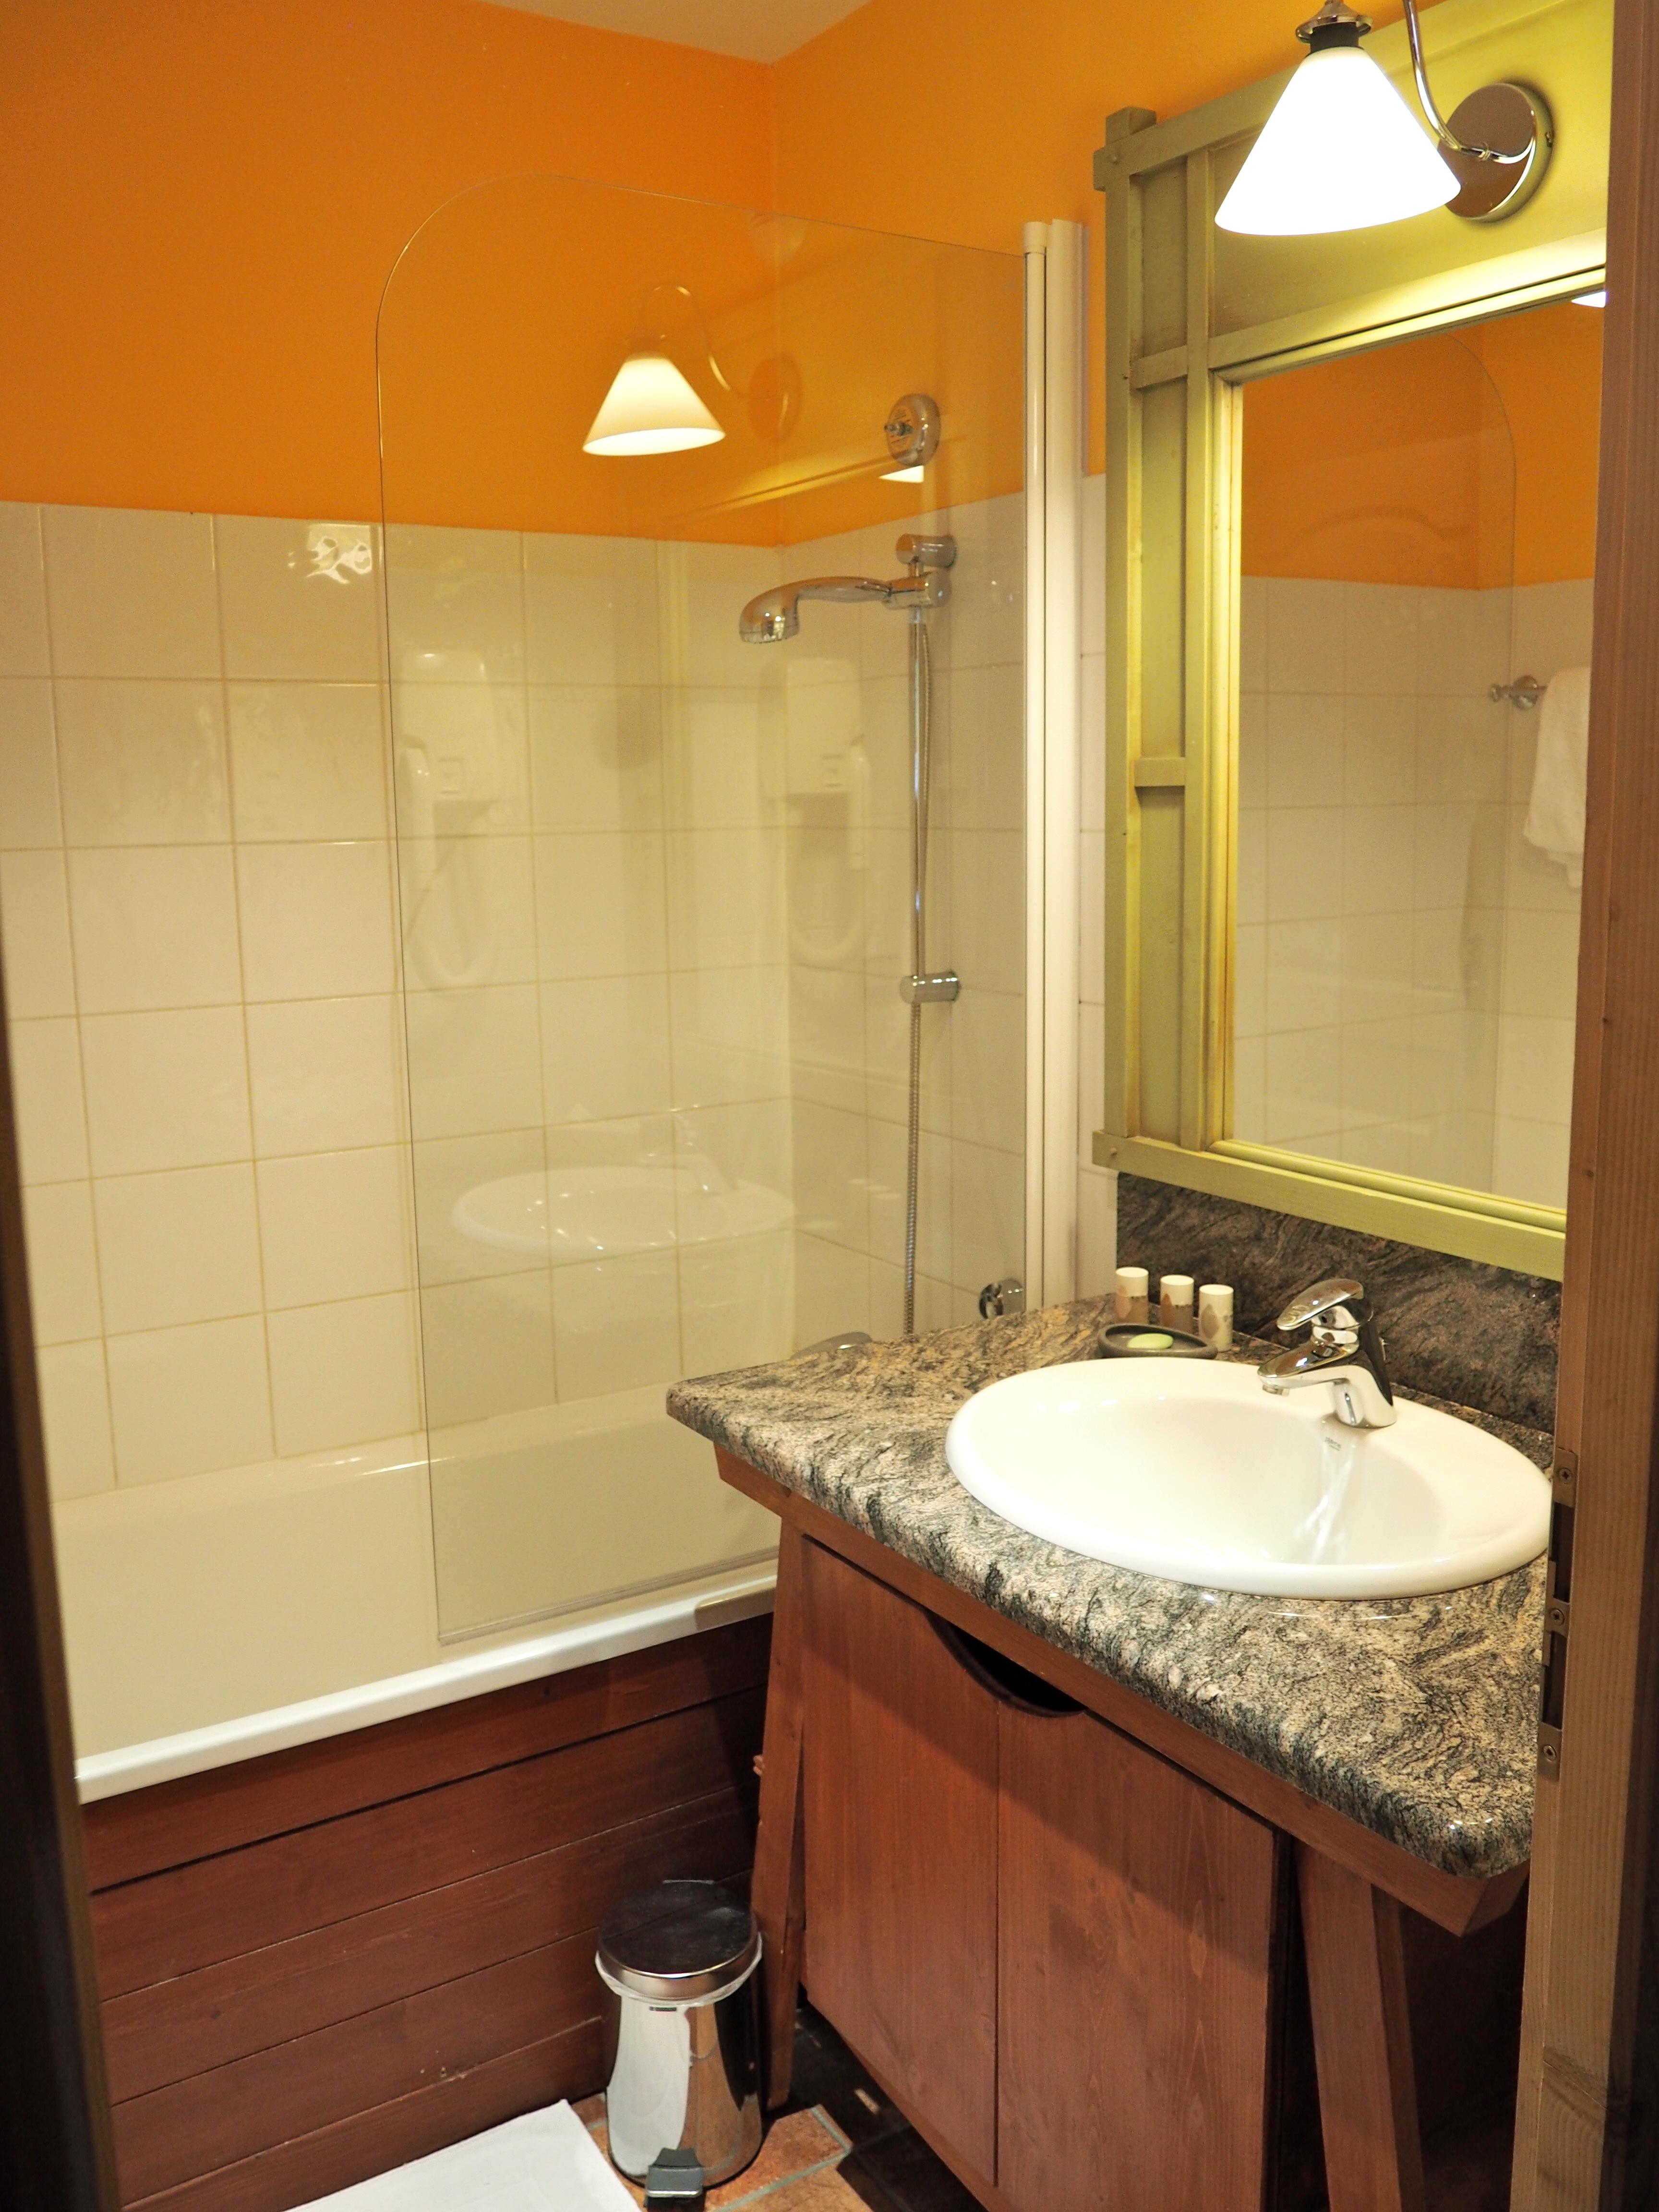 Salle De Bain 2017 salle de bain | arc 1950 direct